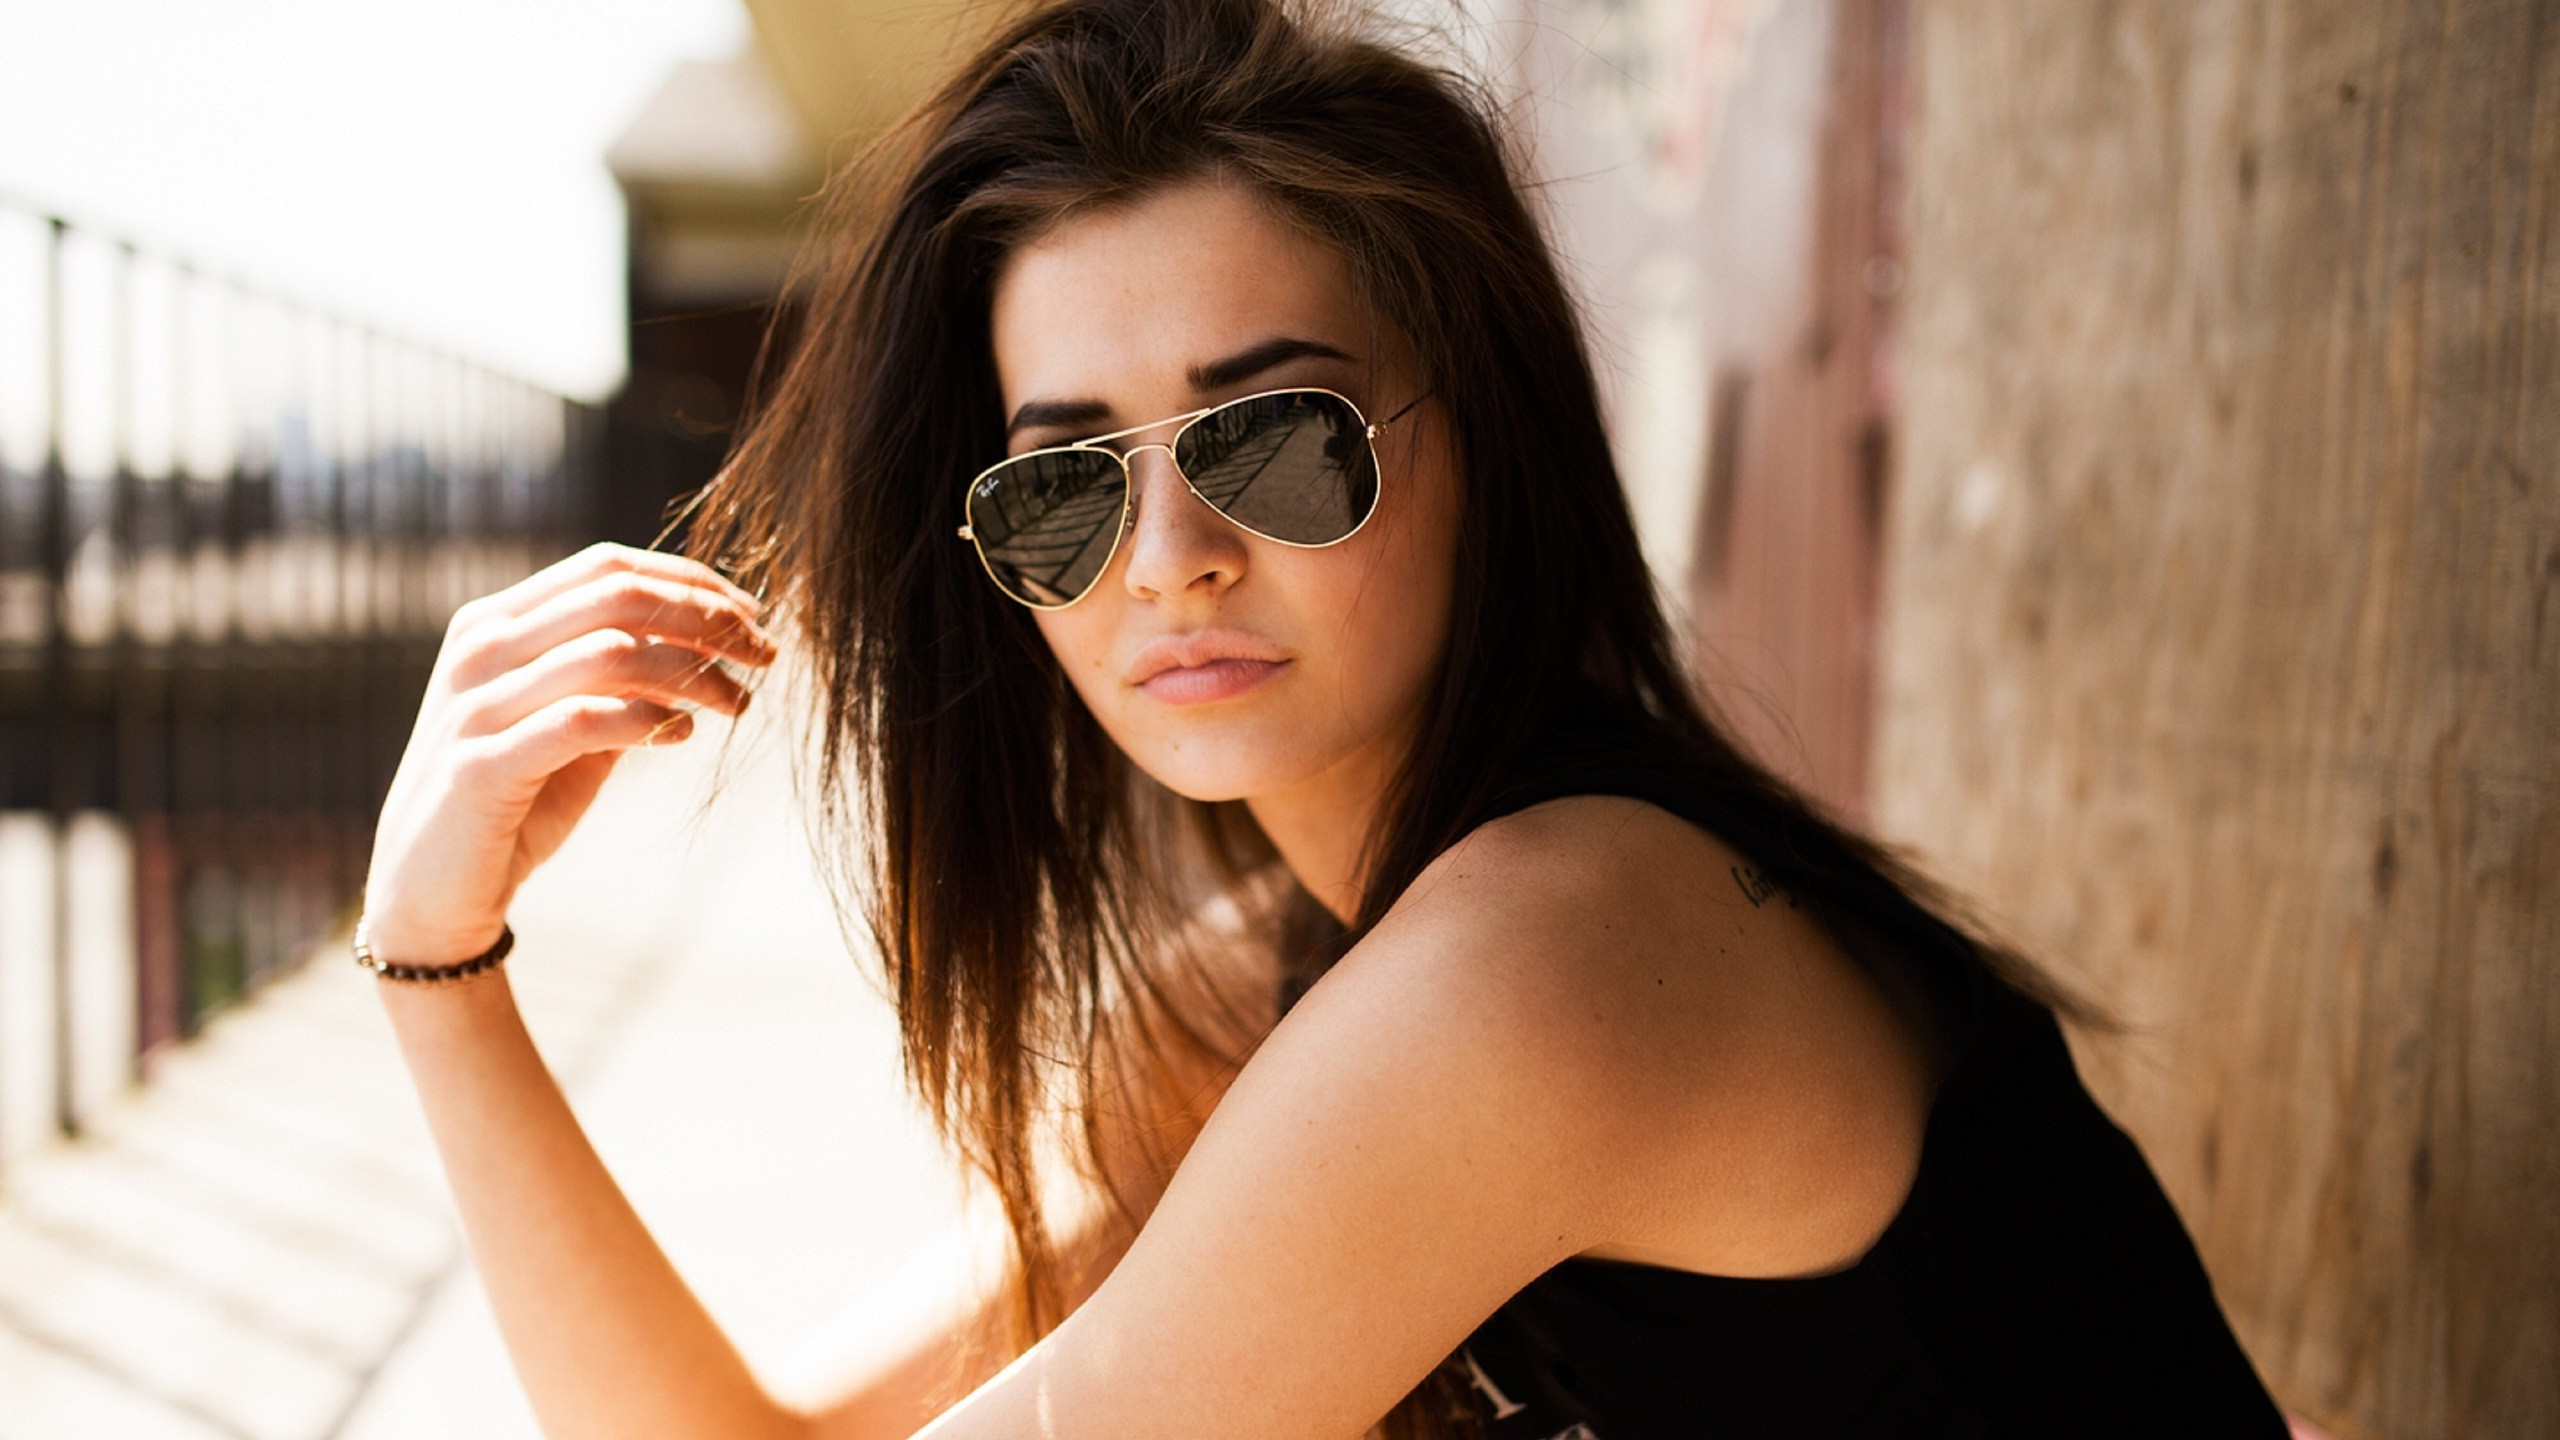 girl-with-aviator-sunglasses-girl-hd-wallpaper-2560x1440-39272.jpg